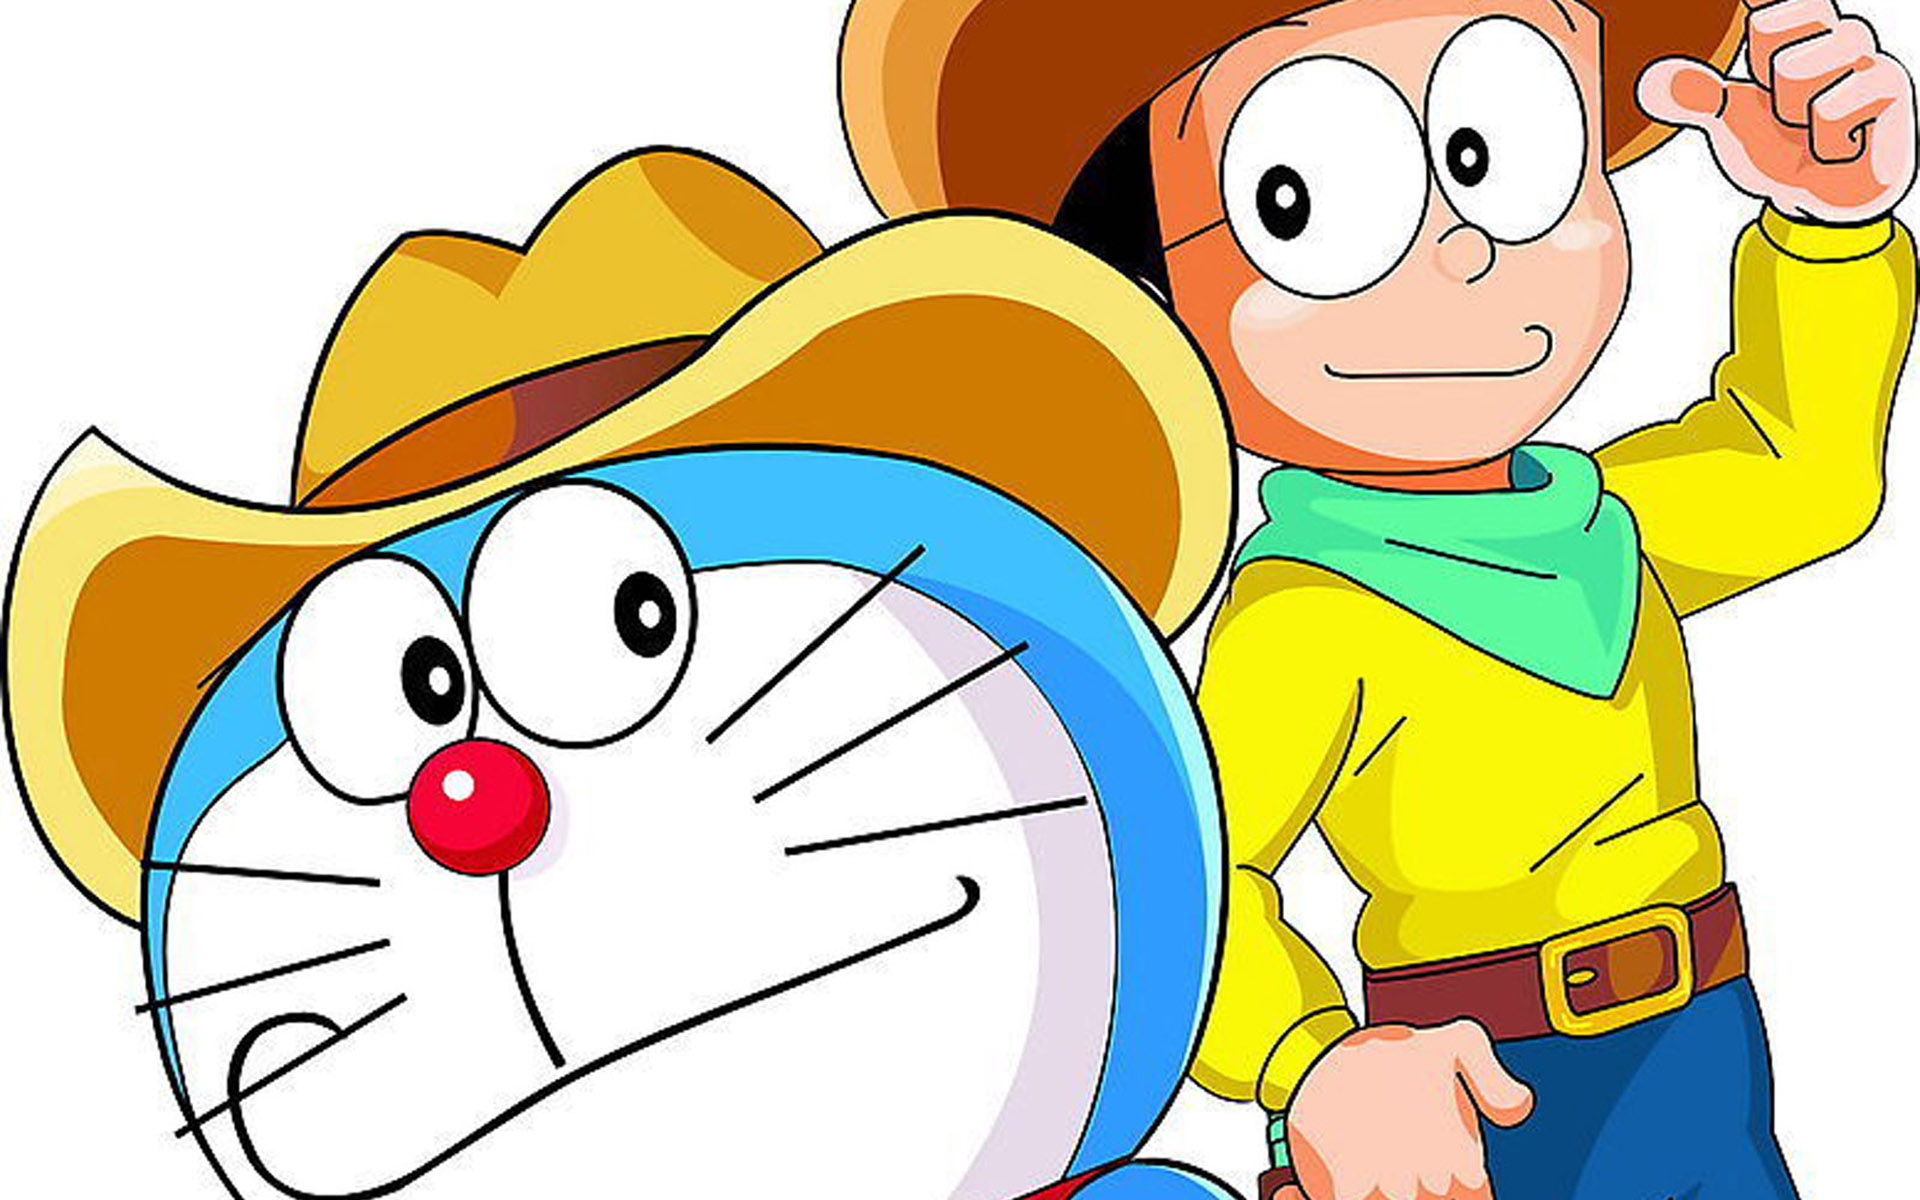 Free Doraemon Live Wallpaper Android APK Download For Android GetJar